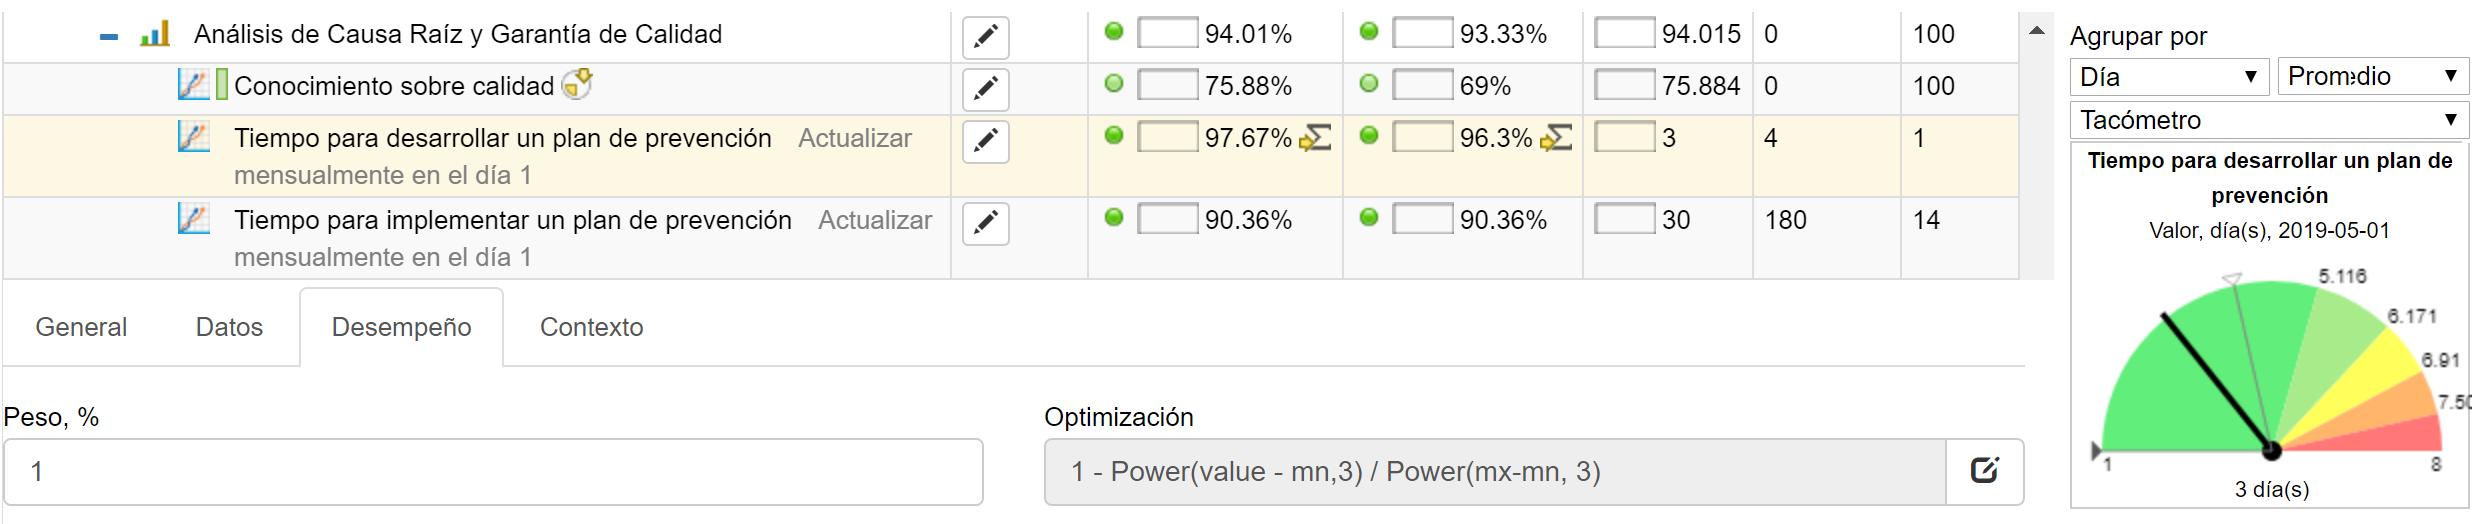 Fórmula personalizada para el indicador